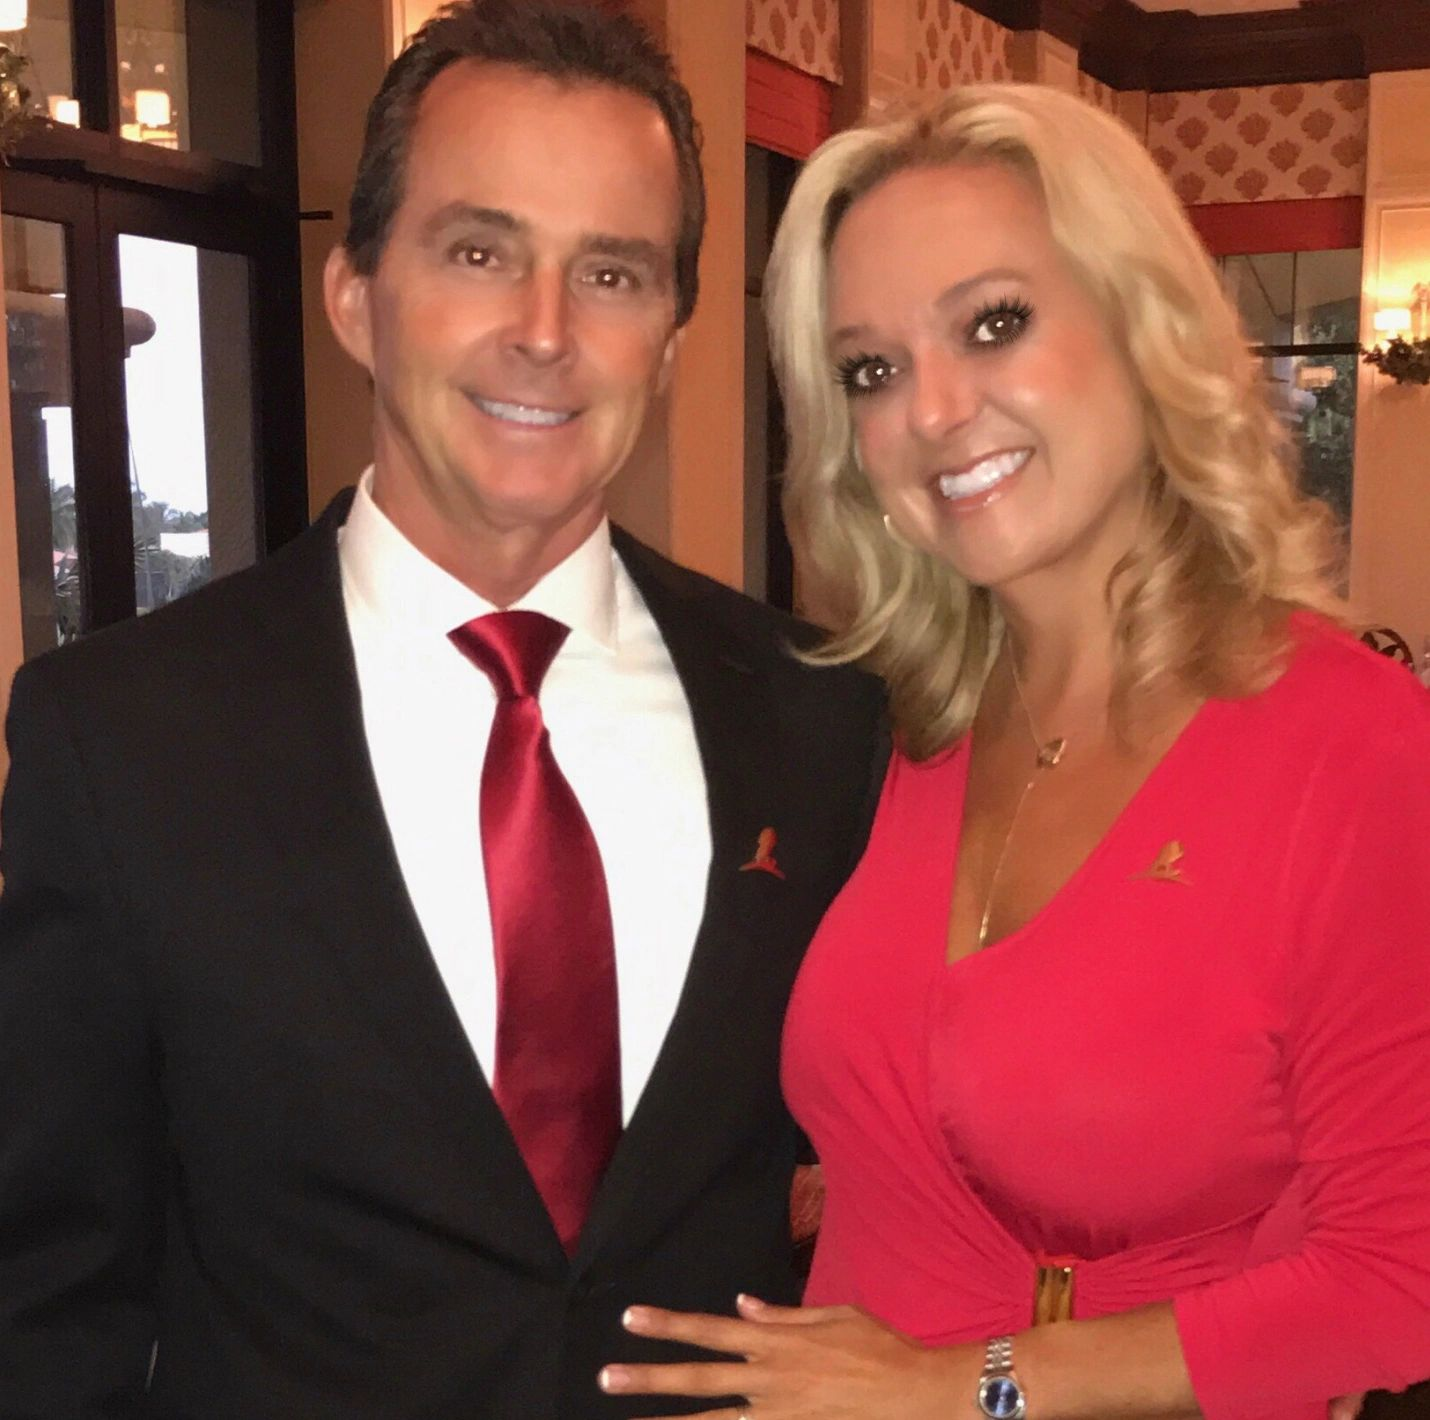 Jennifer Stacy Wink News Wwwtopsimagescom